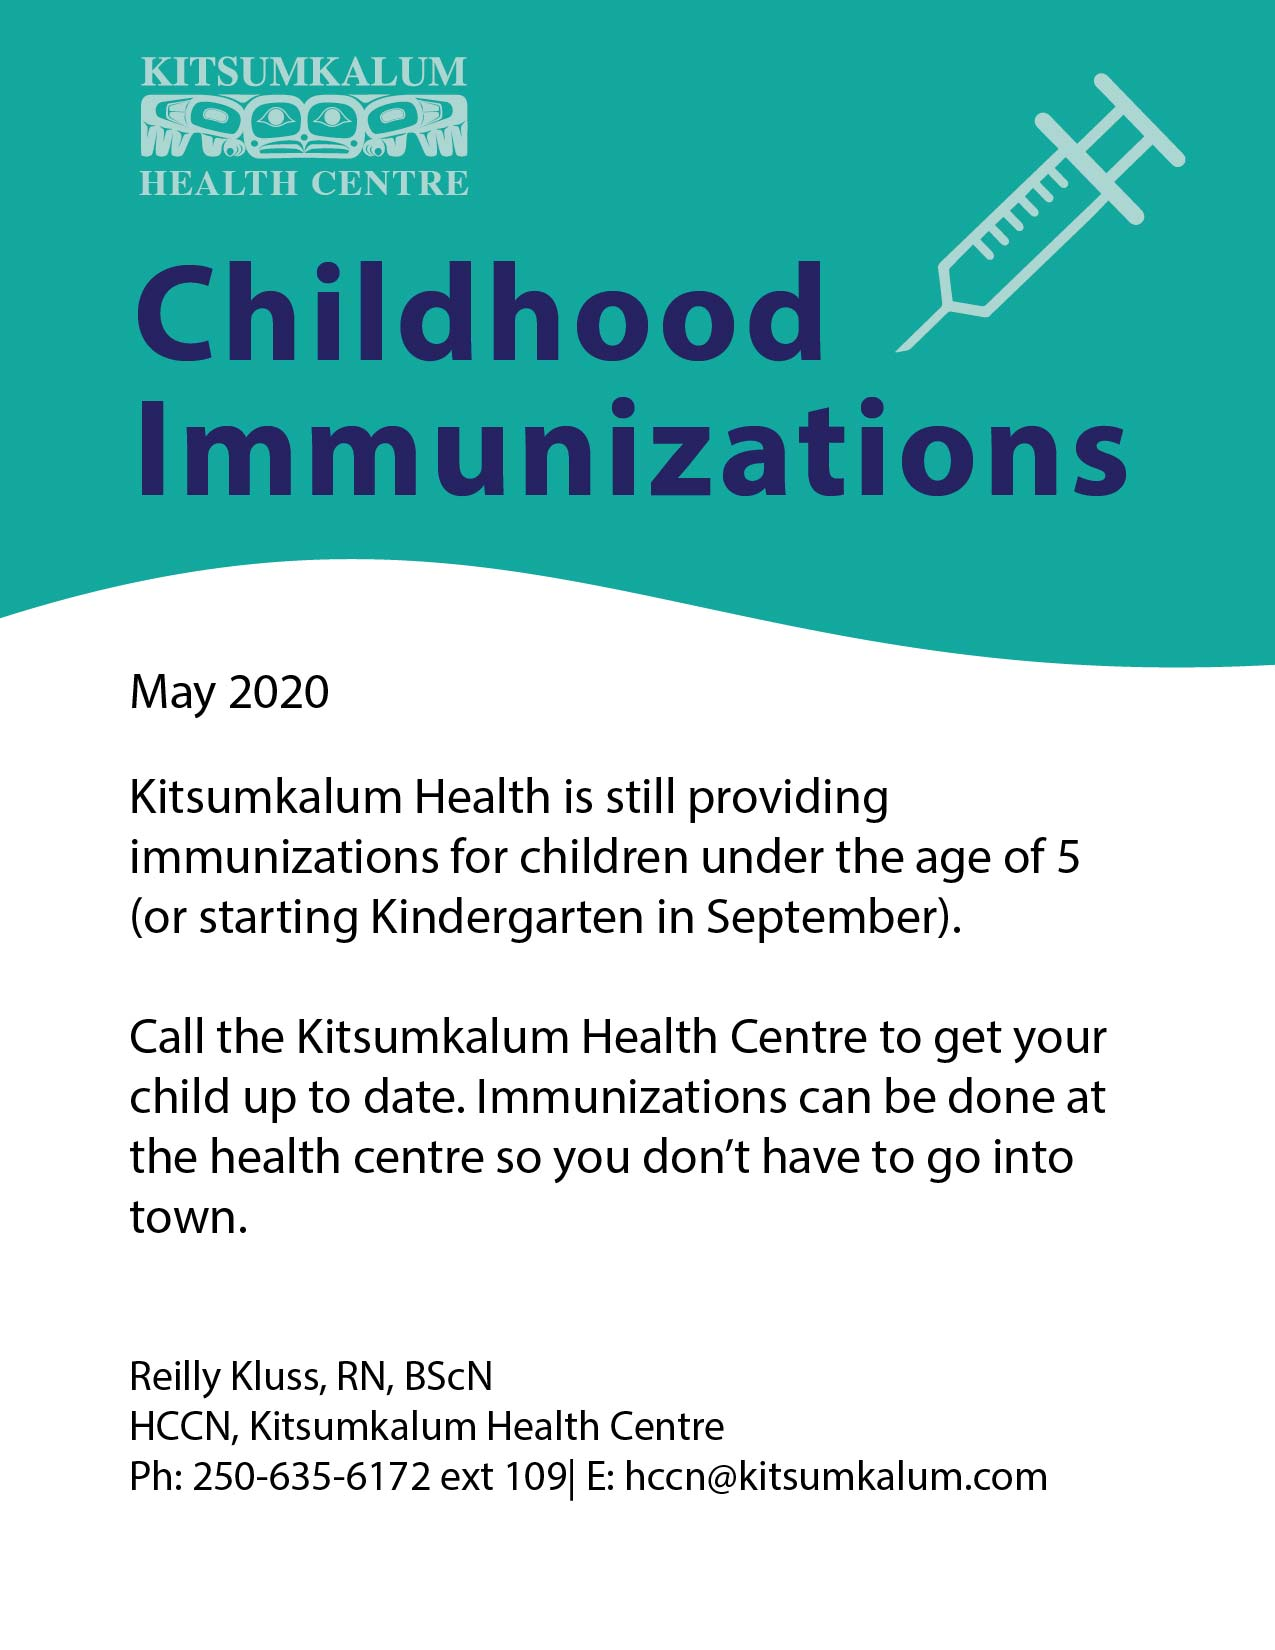 Childhood Immunizations Offered at Kitsumkalum Health